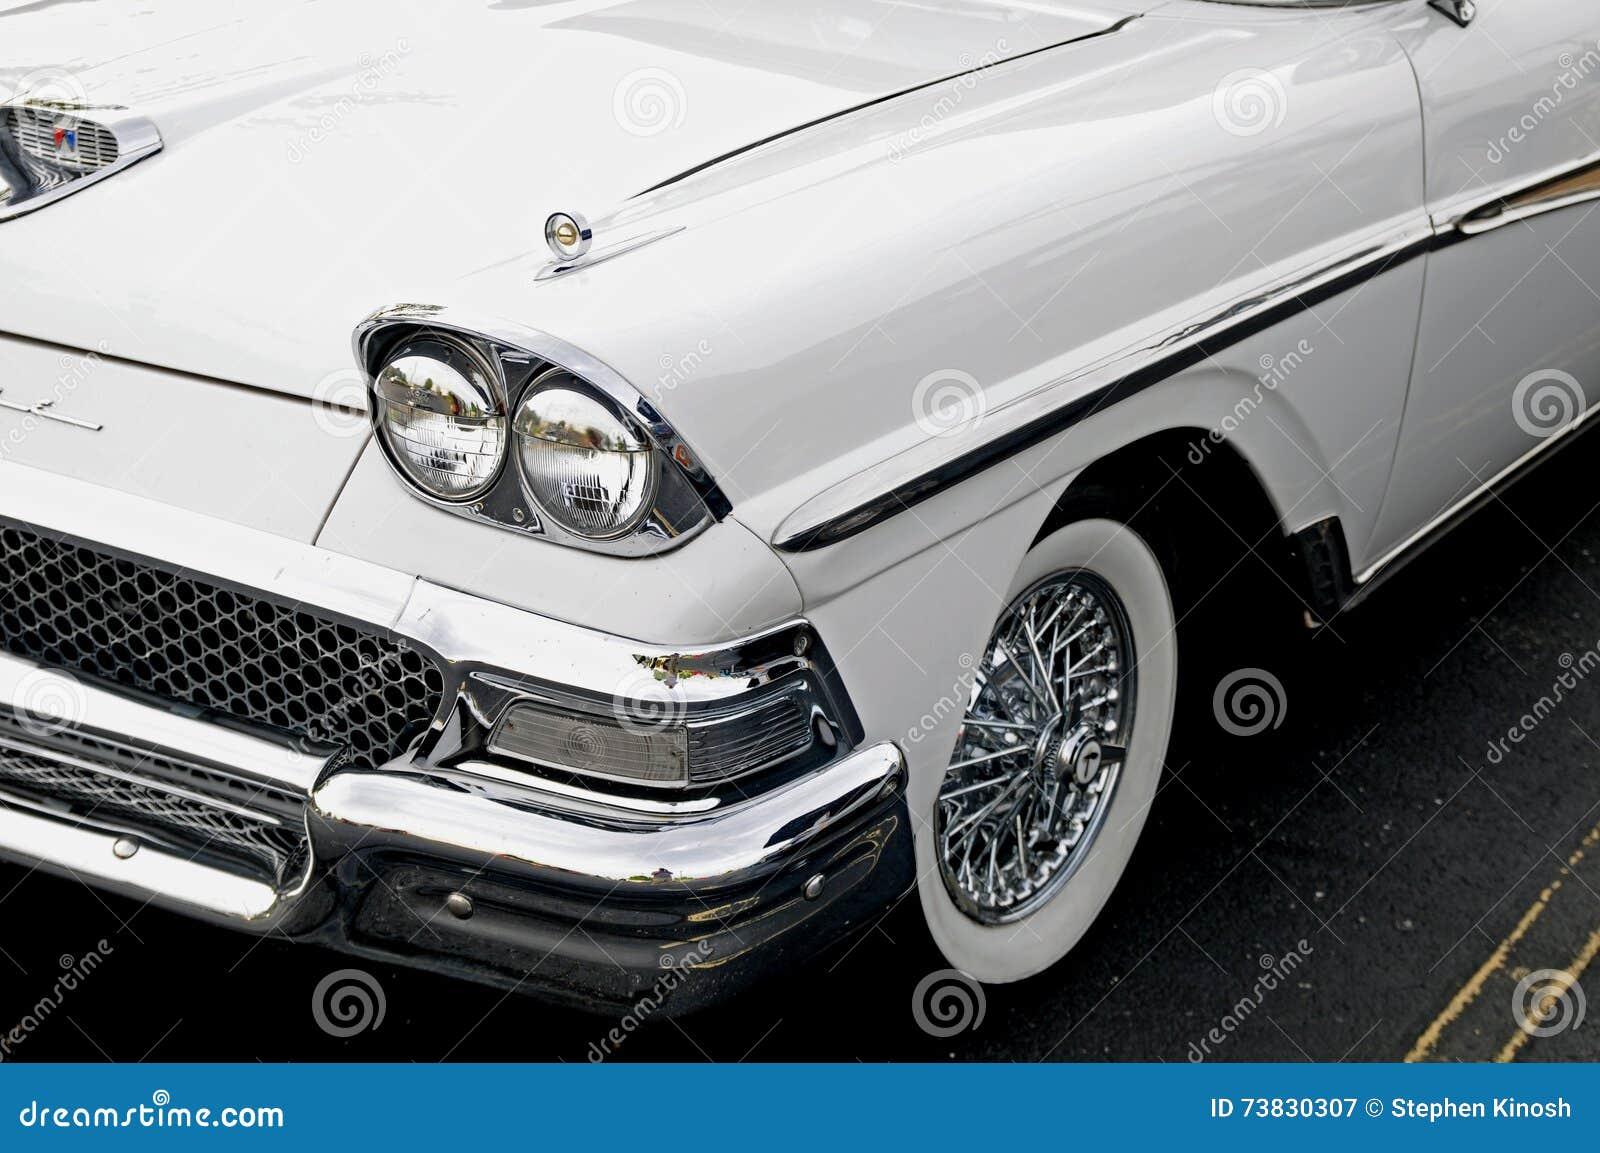 Classic Ford Fairlane Stock Image Of Chrome Drag 73830307 1950s Bumper